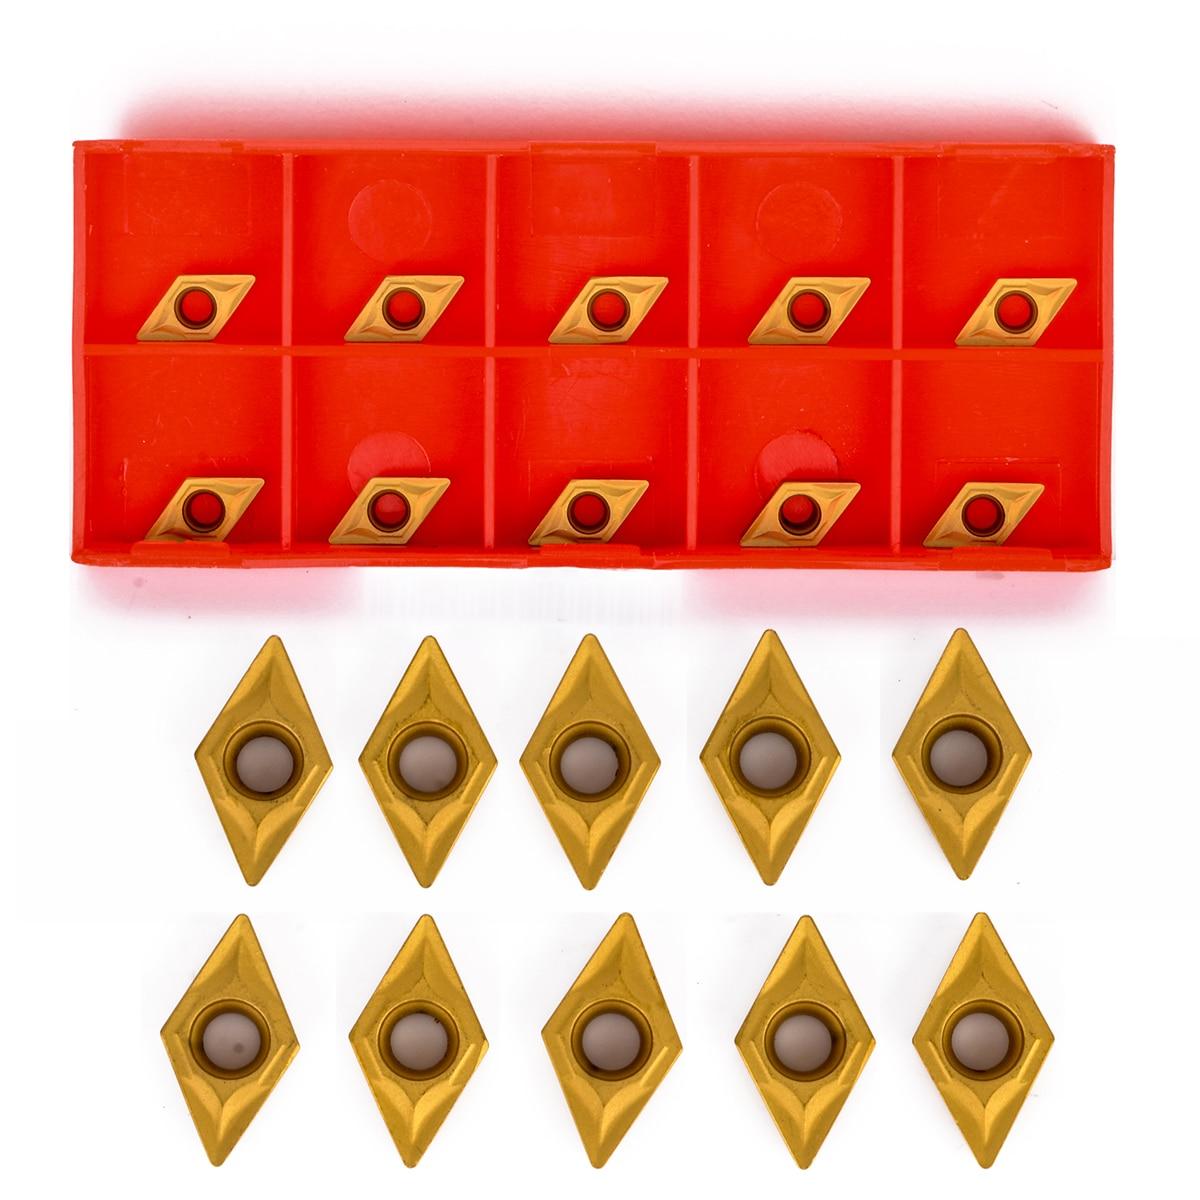 10pcs DCMT070204 YBC251 Carbide Inserts High Precision Turning Insert For Lathe Turning Tool Boring Bar